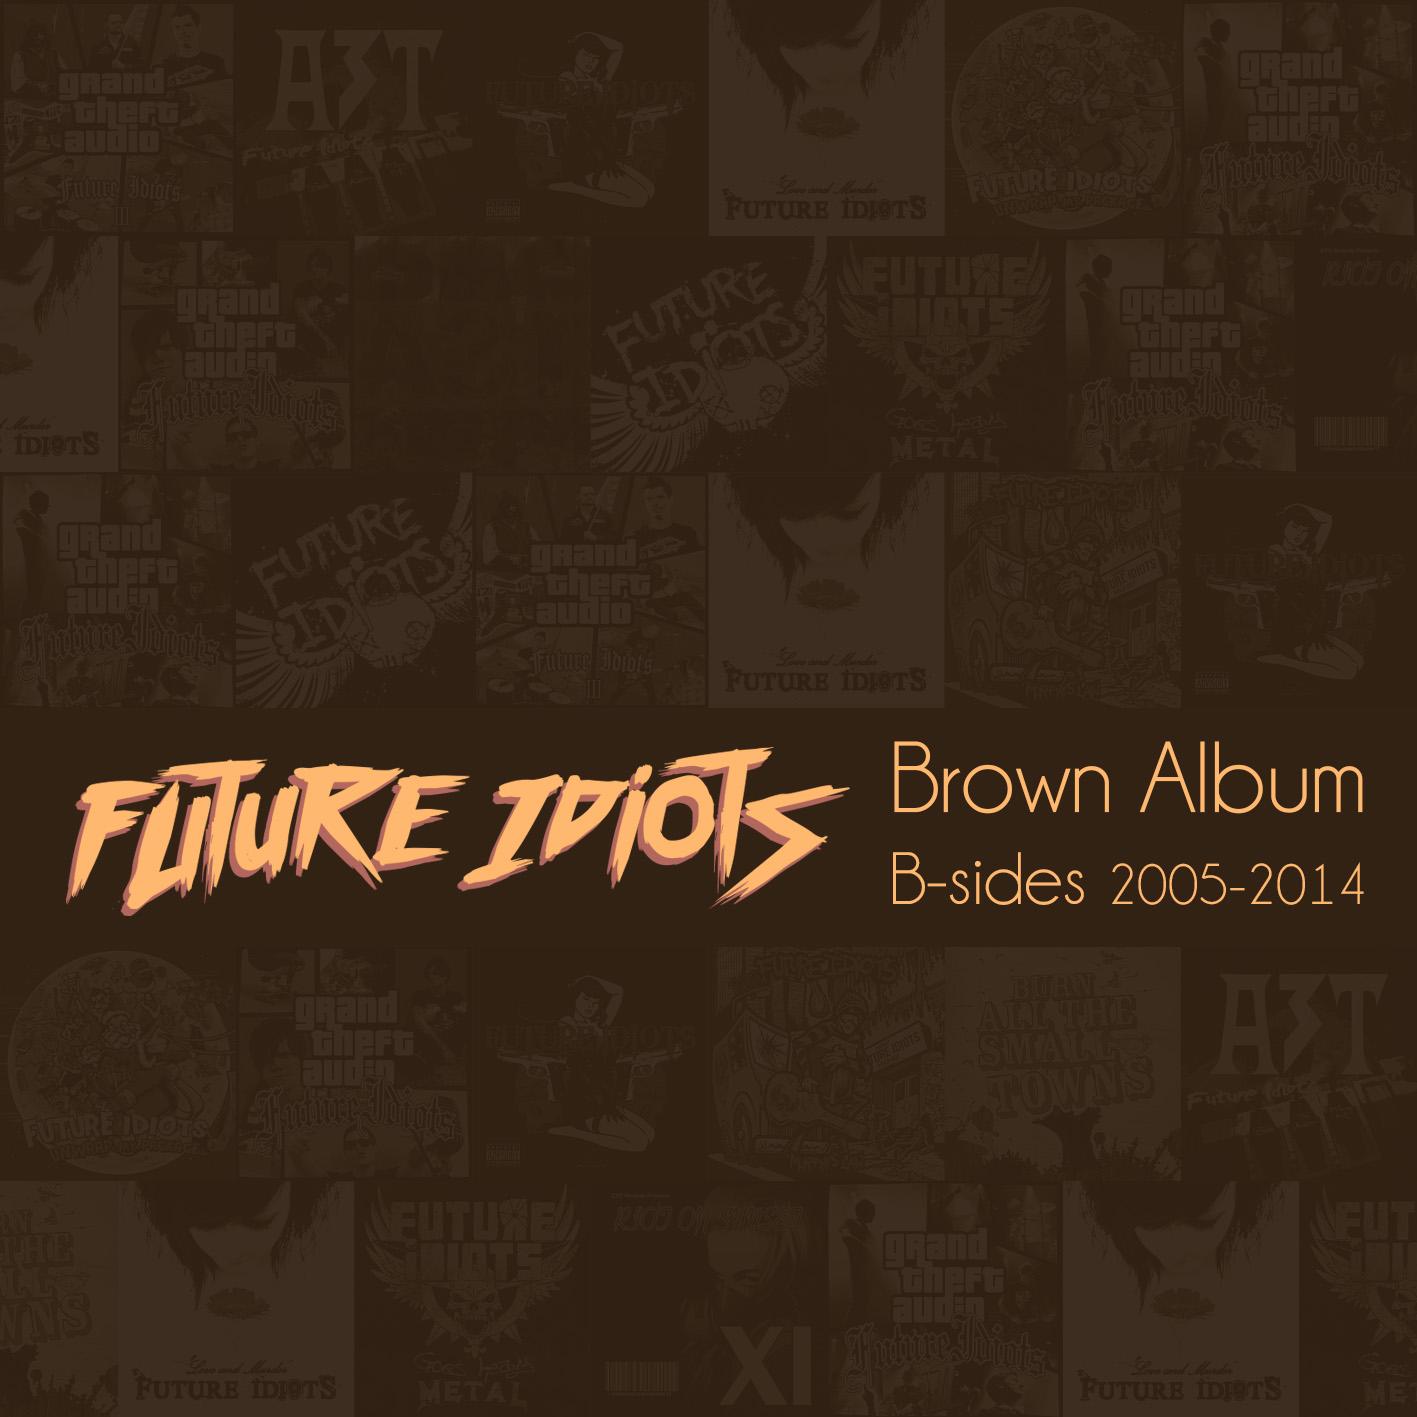 Future Idiots - Brown Album (B-sides 2005-2014) cover art.jpg